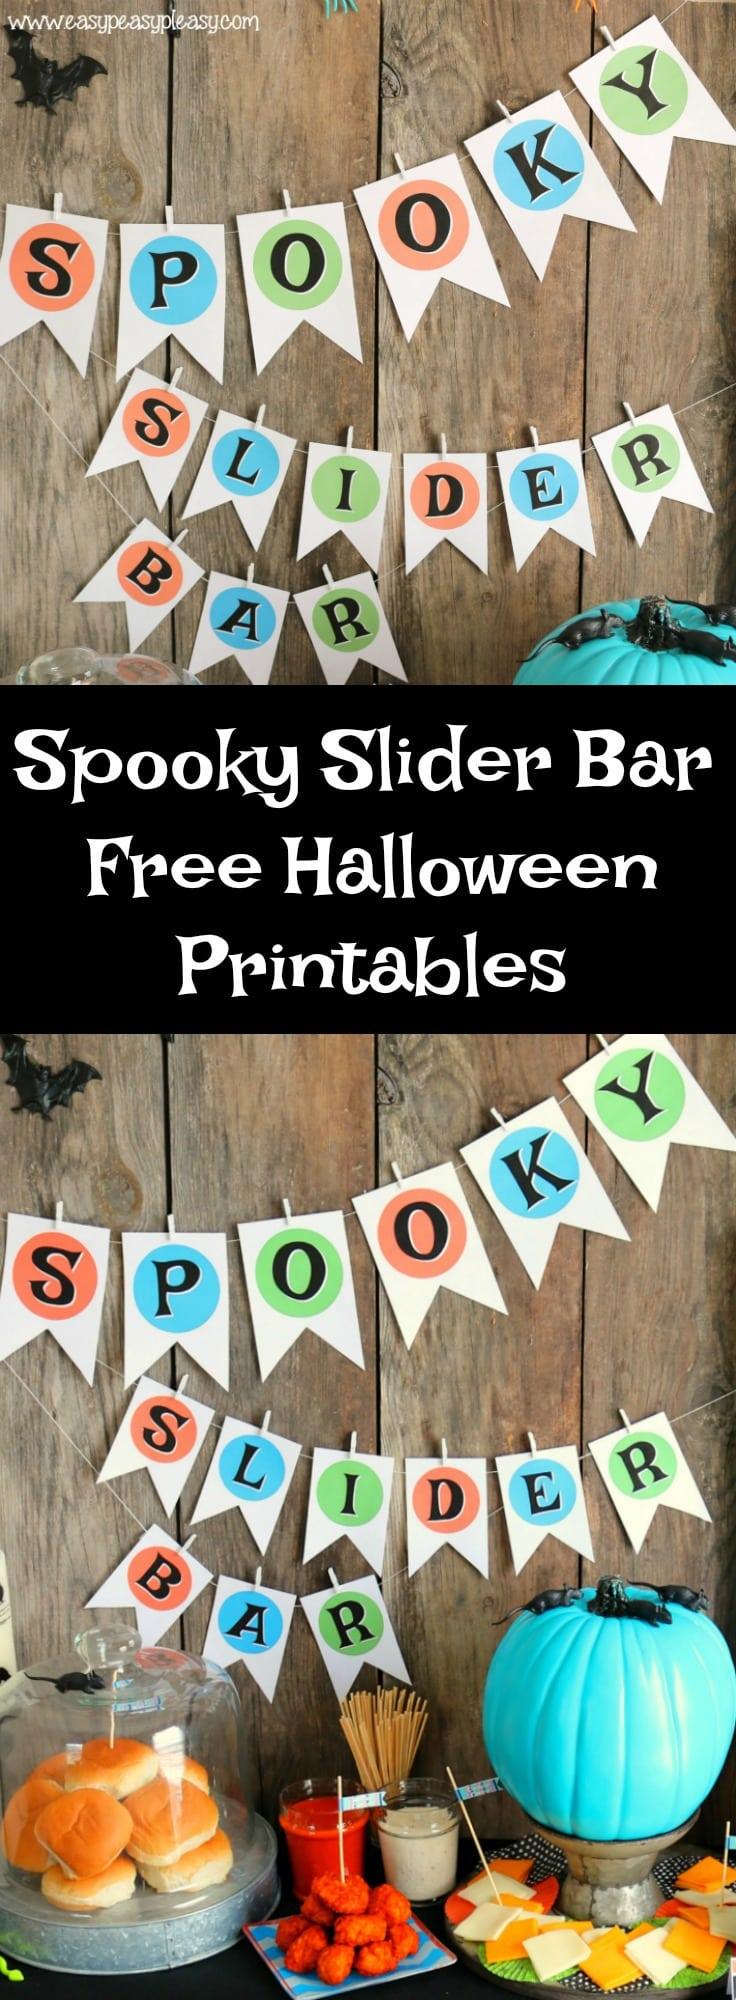 Free Spooky Slider Bar Halloween Printables.